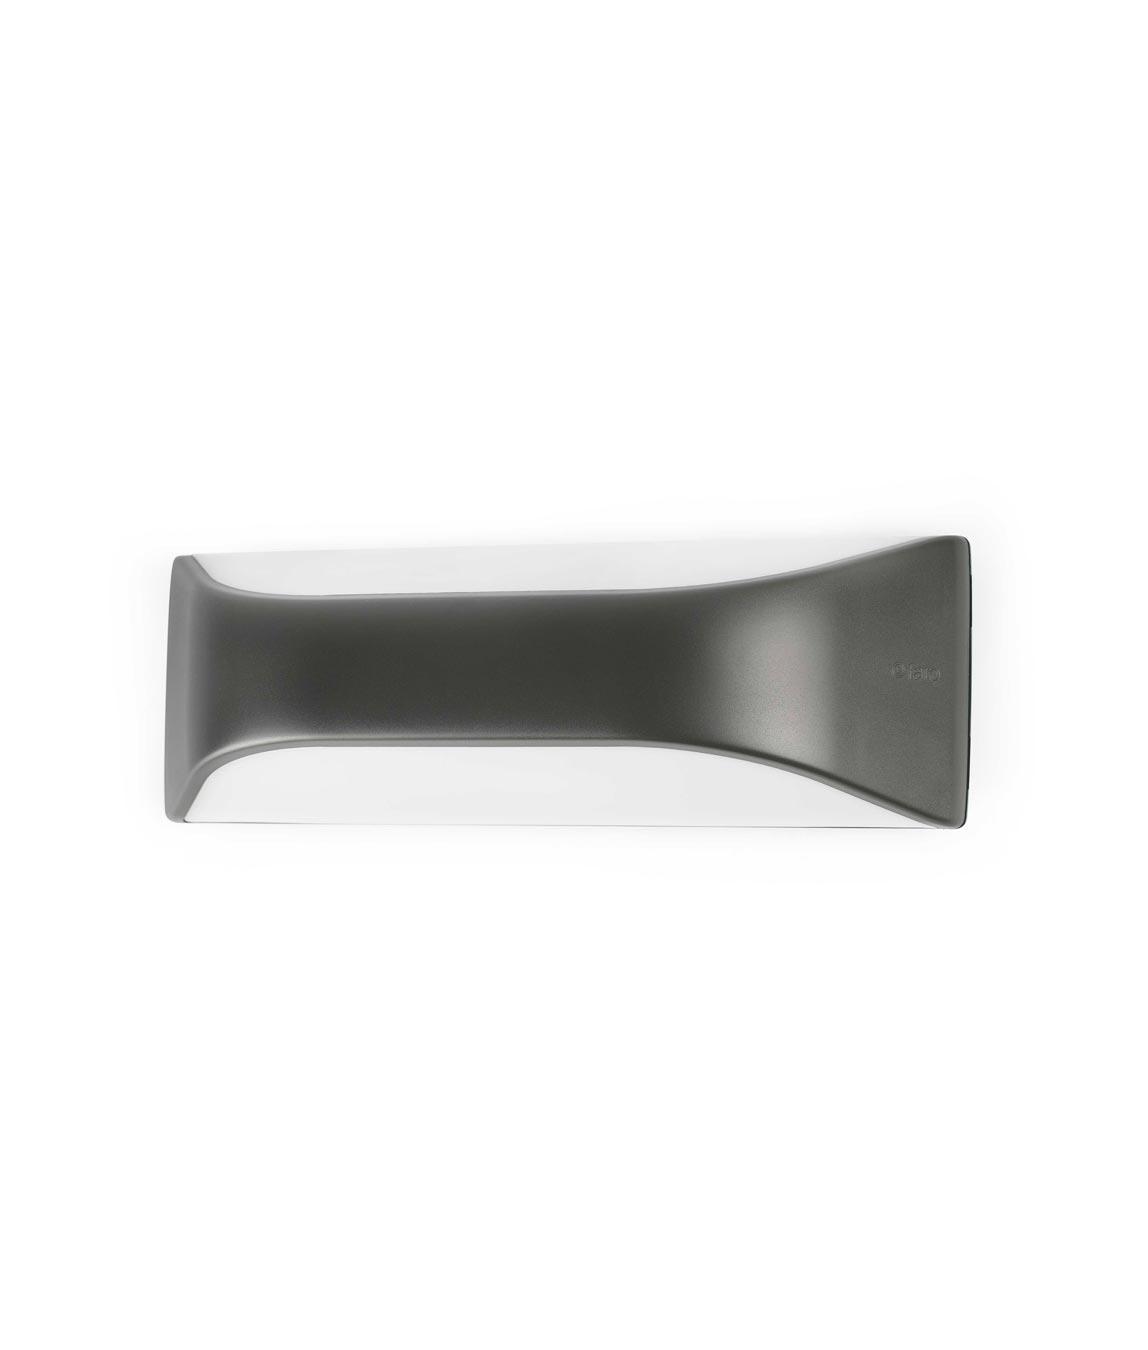 Aplique VIEW gris oscuro